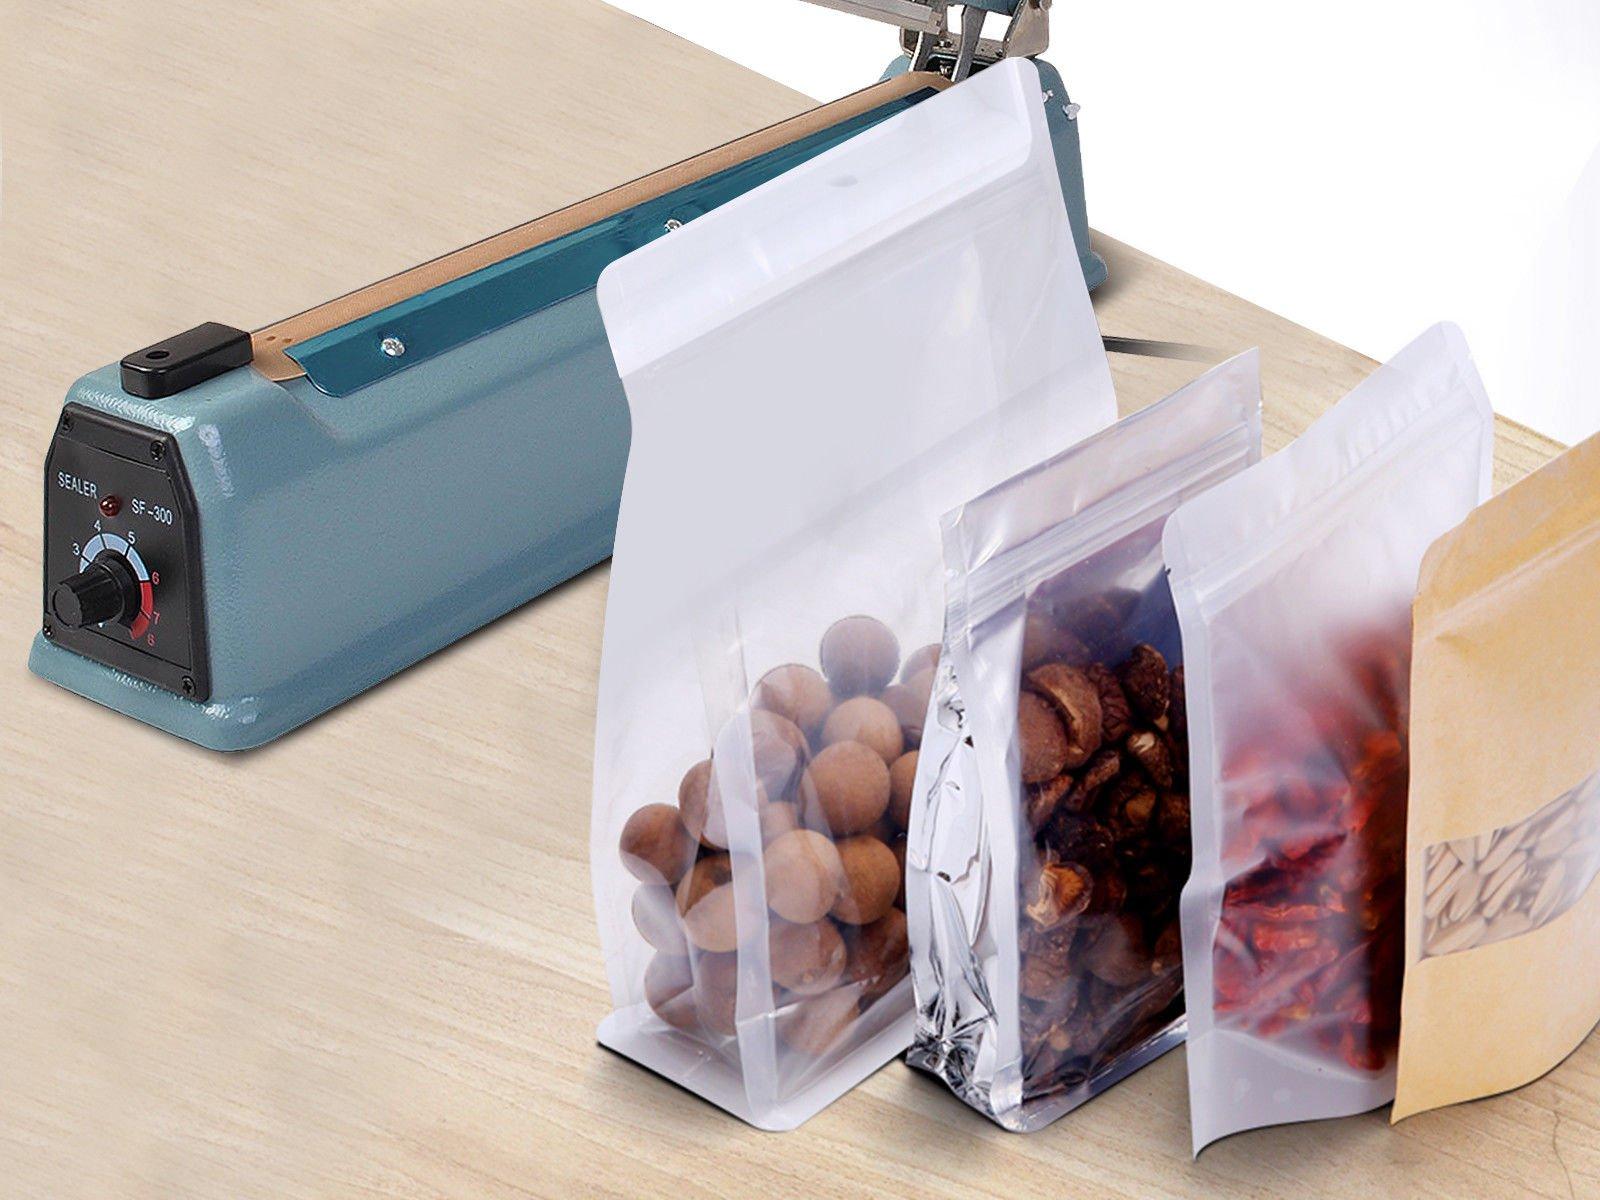 Super buy 12'' Heat Sealing Hand Impulse Sealer Machine Poly Free Element Grip& Teflon by Goplus (Image #2)